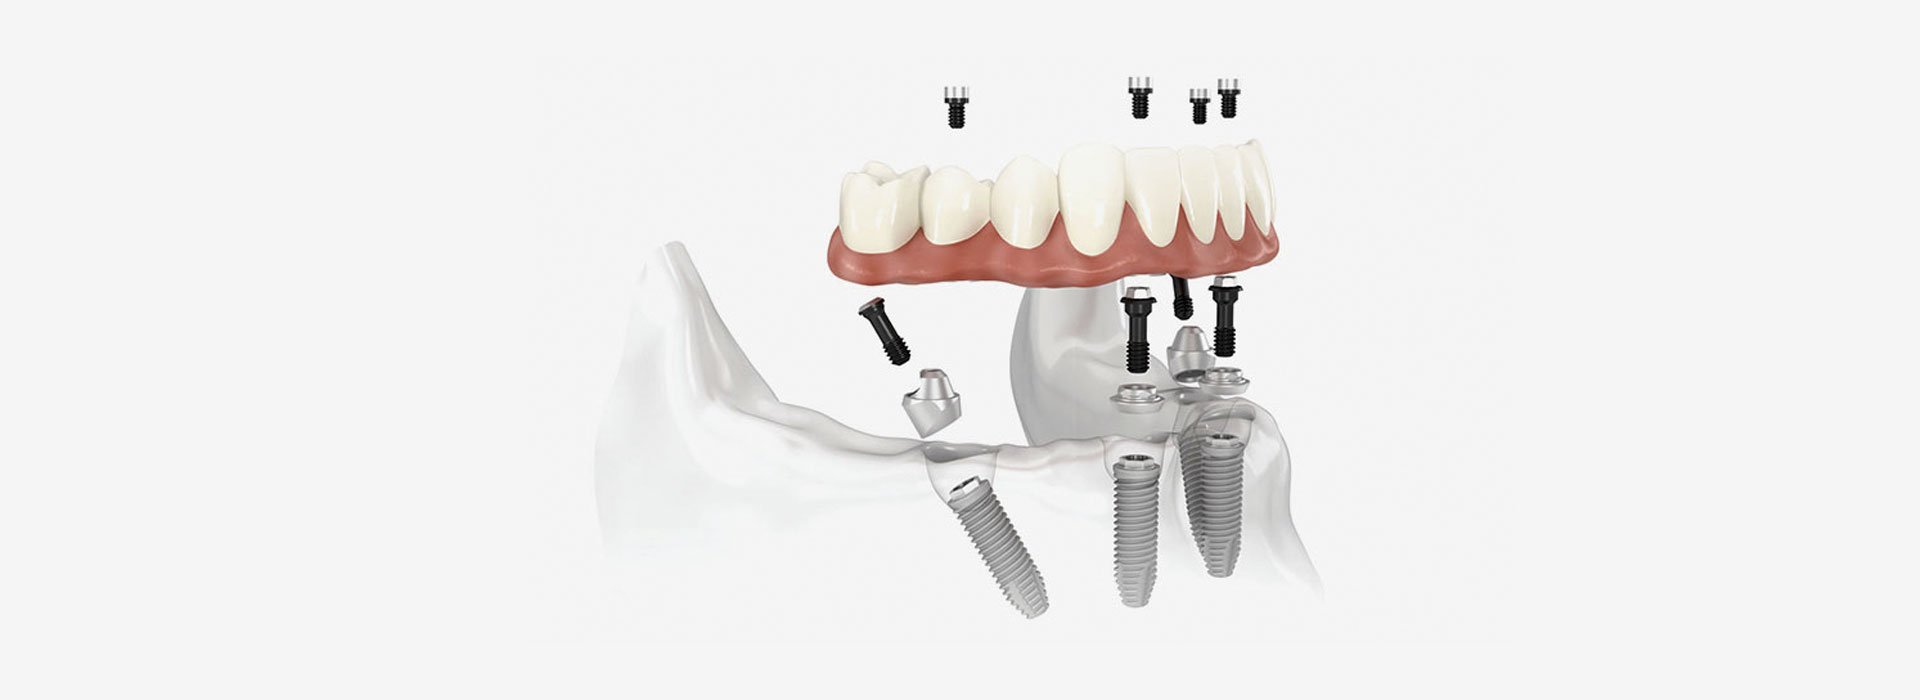 implantologia a foligno | Studio Calvi 1